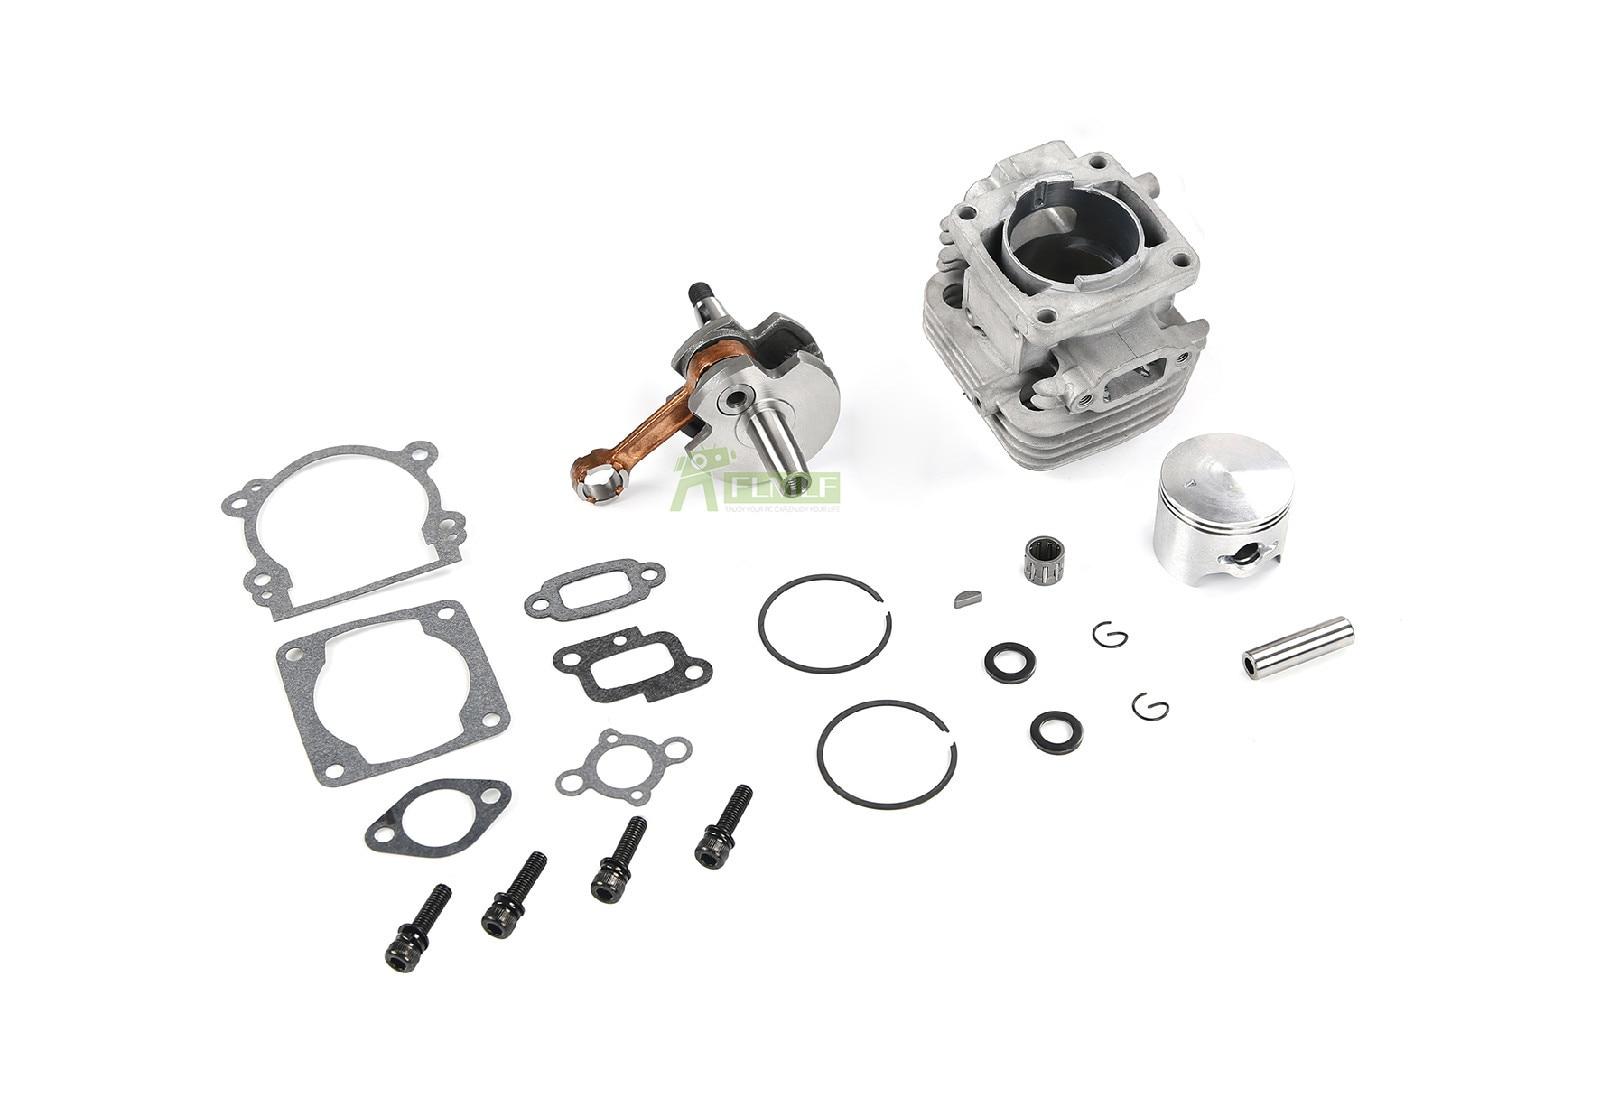 32 Upgrade 36cc Double Piston Ring Retrofit Kit 2t Gasoline Engine For 1 5 Hpi Rovan Rofun Km Baja Losi 5ive T Fg Goped Redcat Parts Accessories Aliexpress